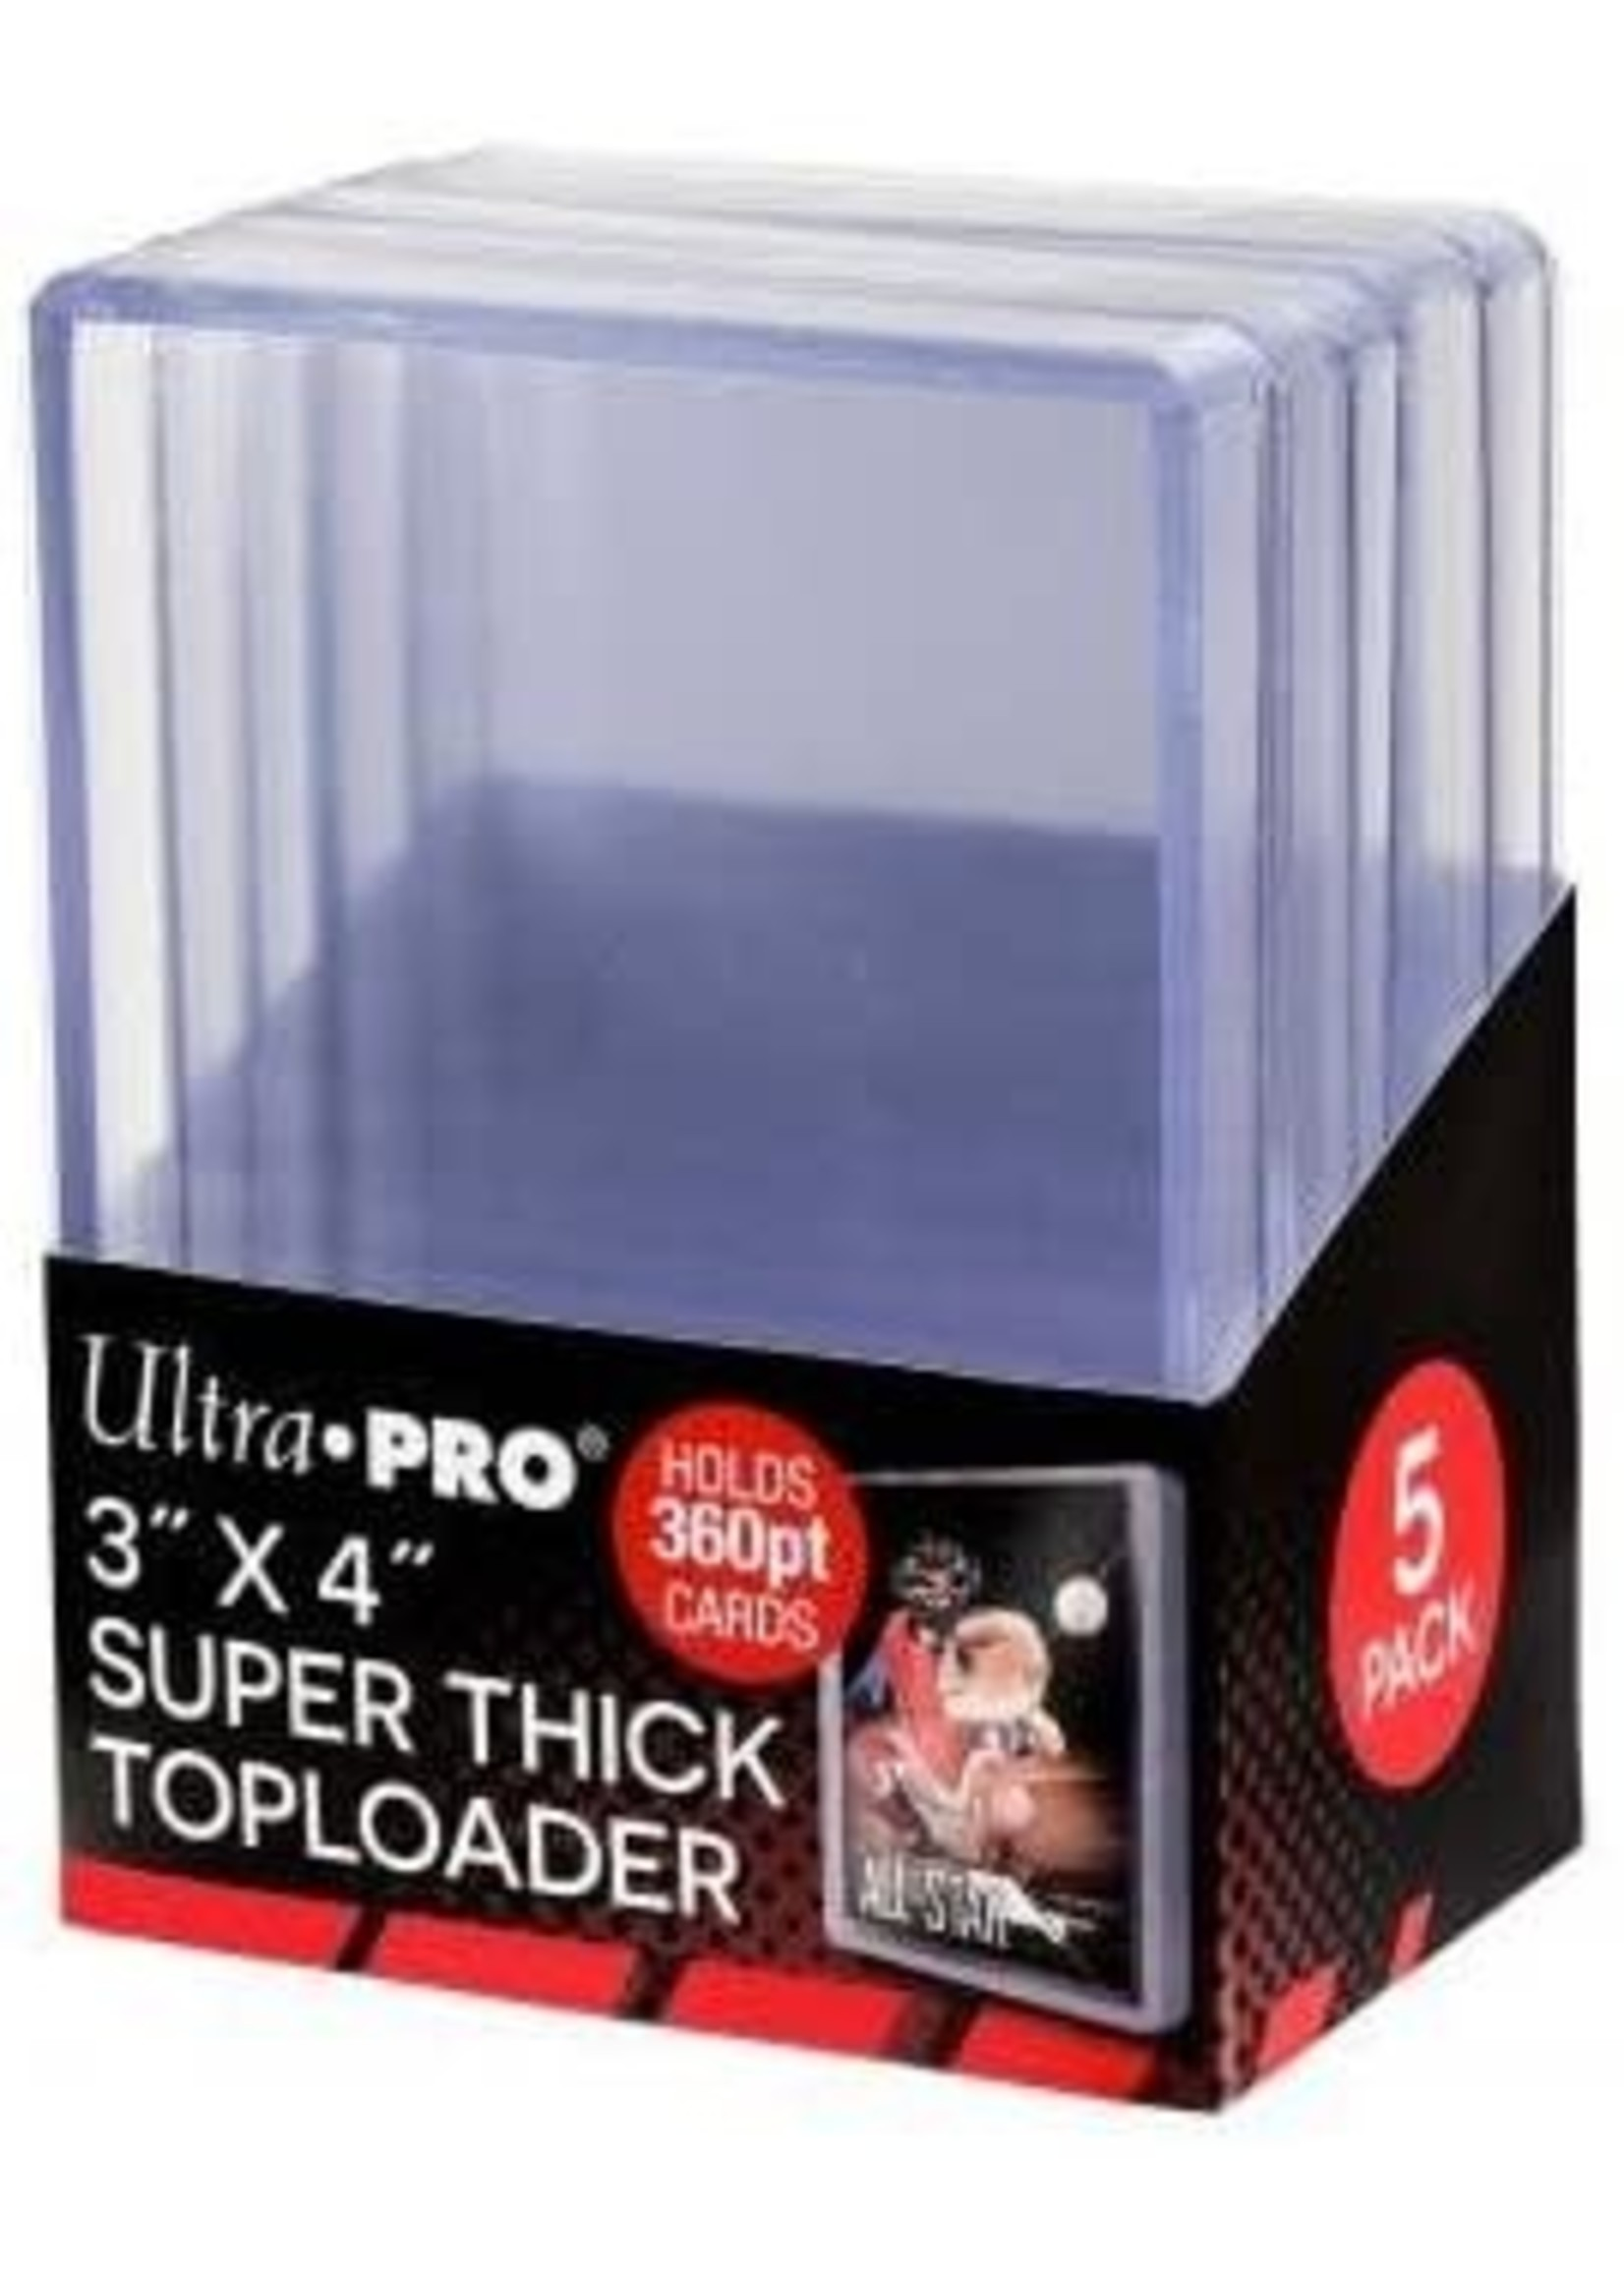 Ultra Pro Toploader 3x4 360Pt Thick